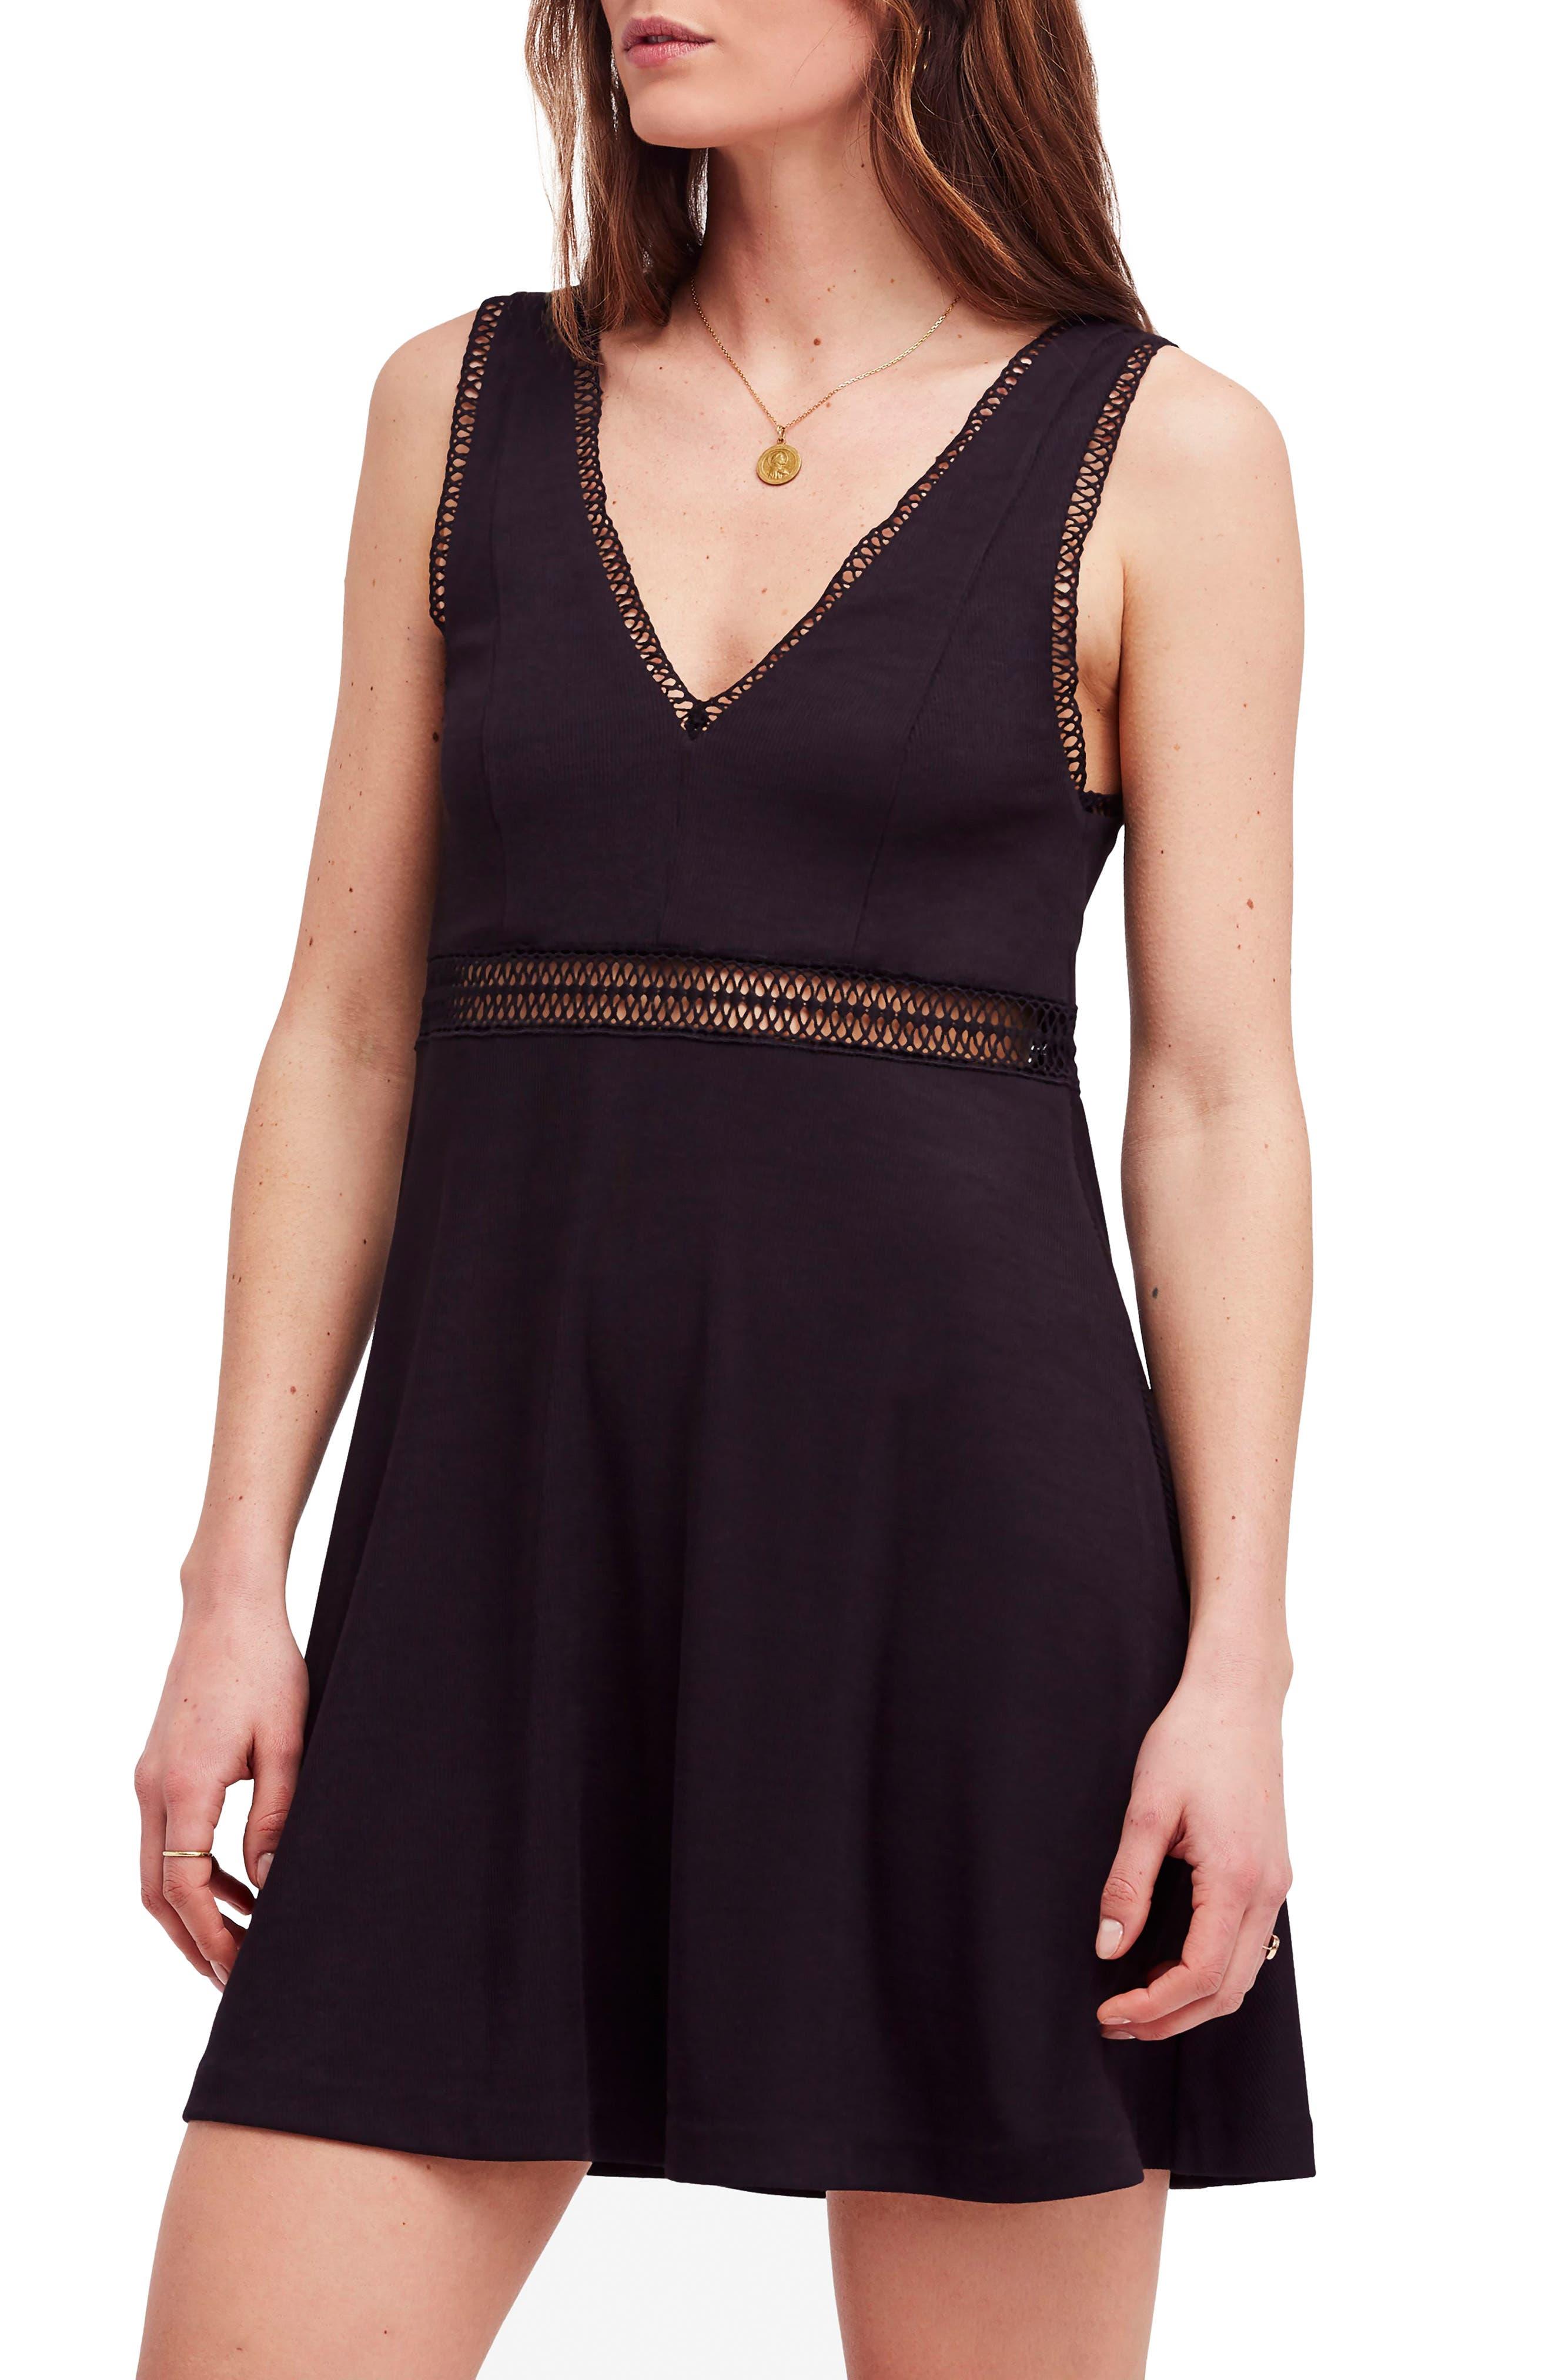 King of My Heart Minidress,                         Main,                         color, Black